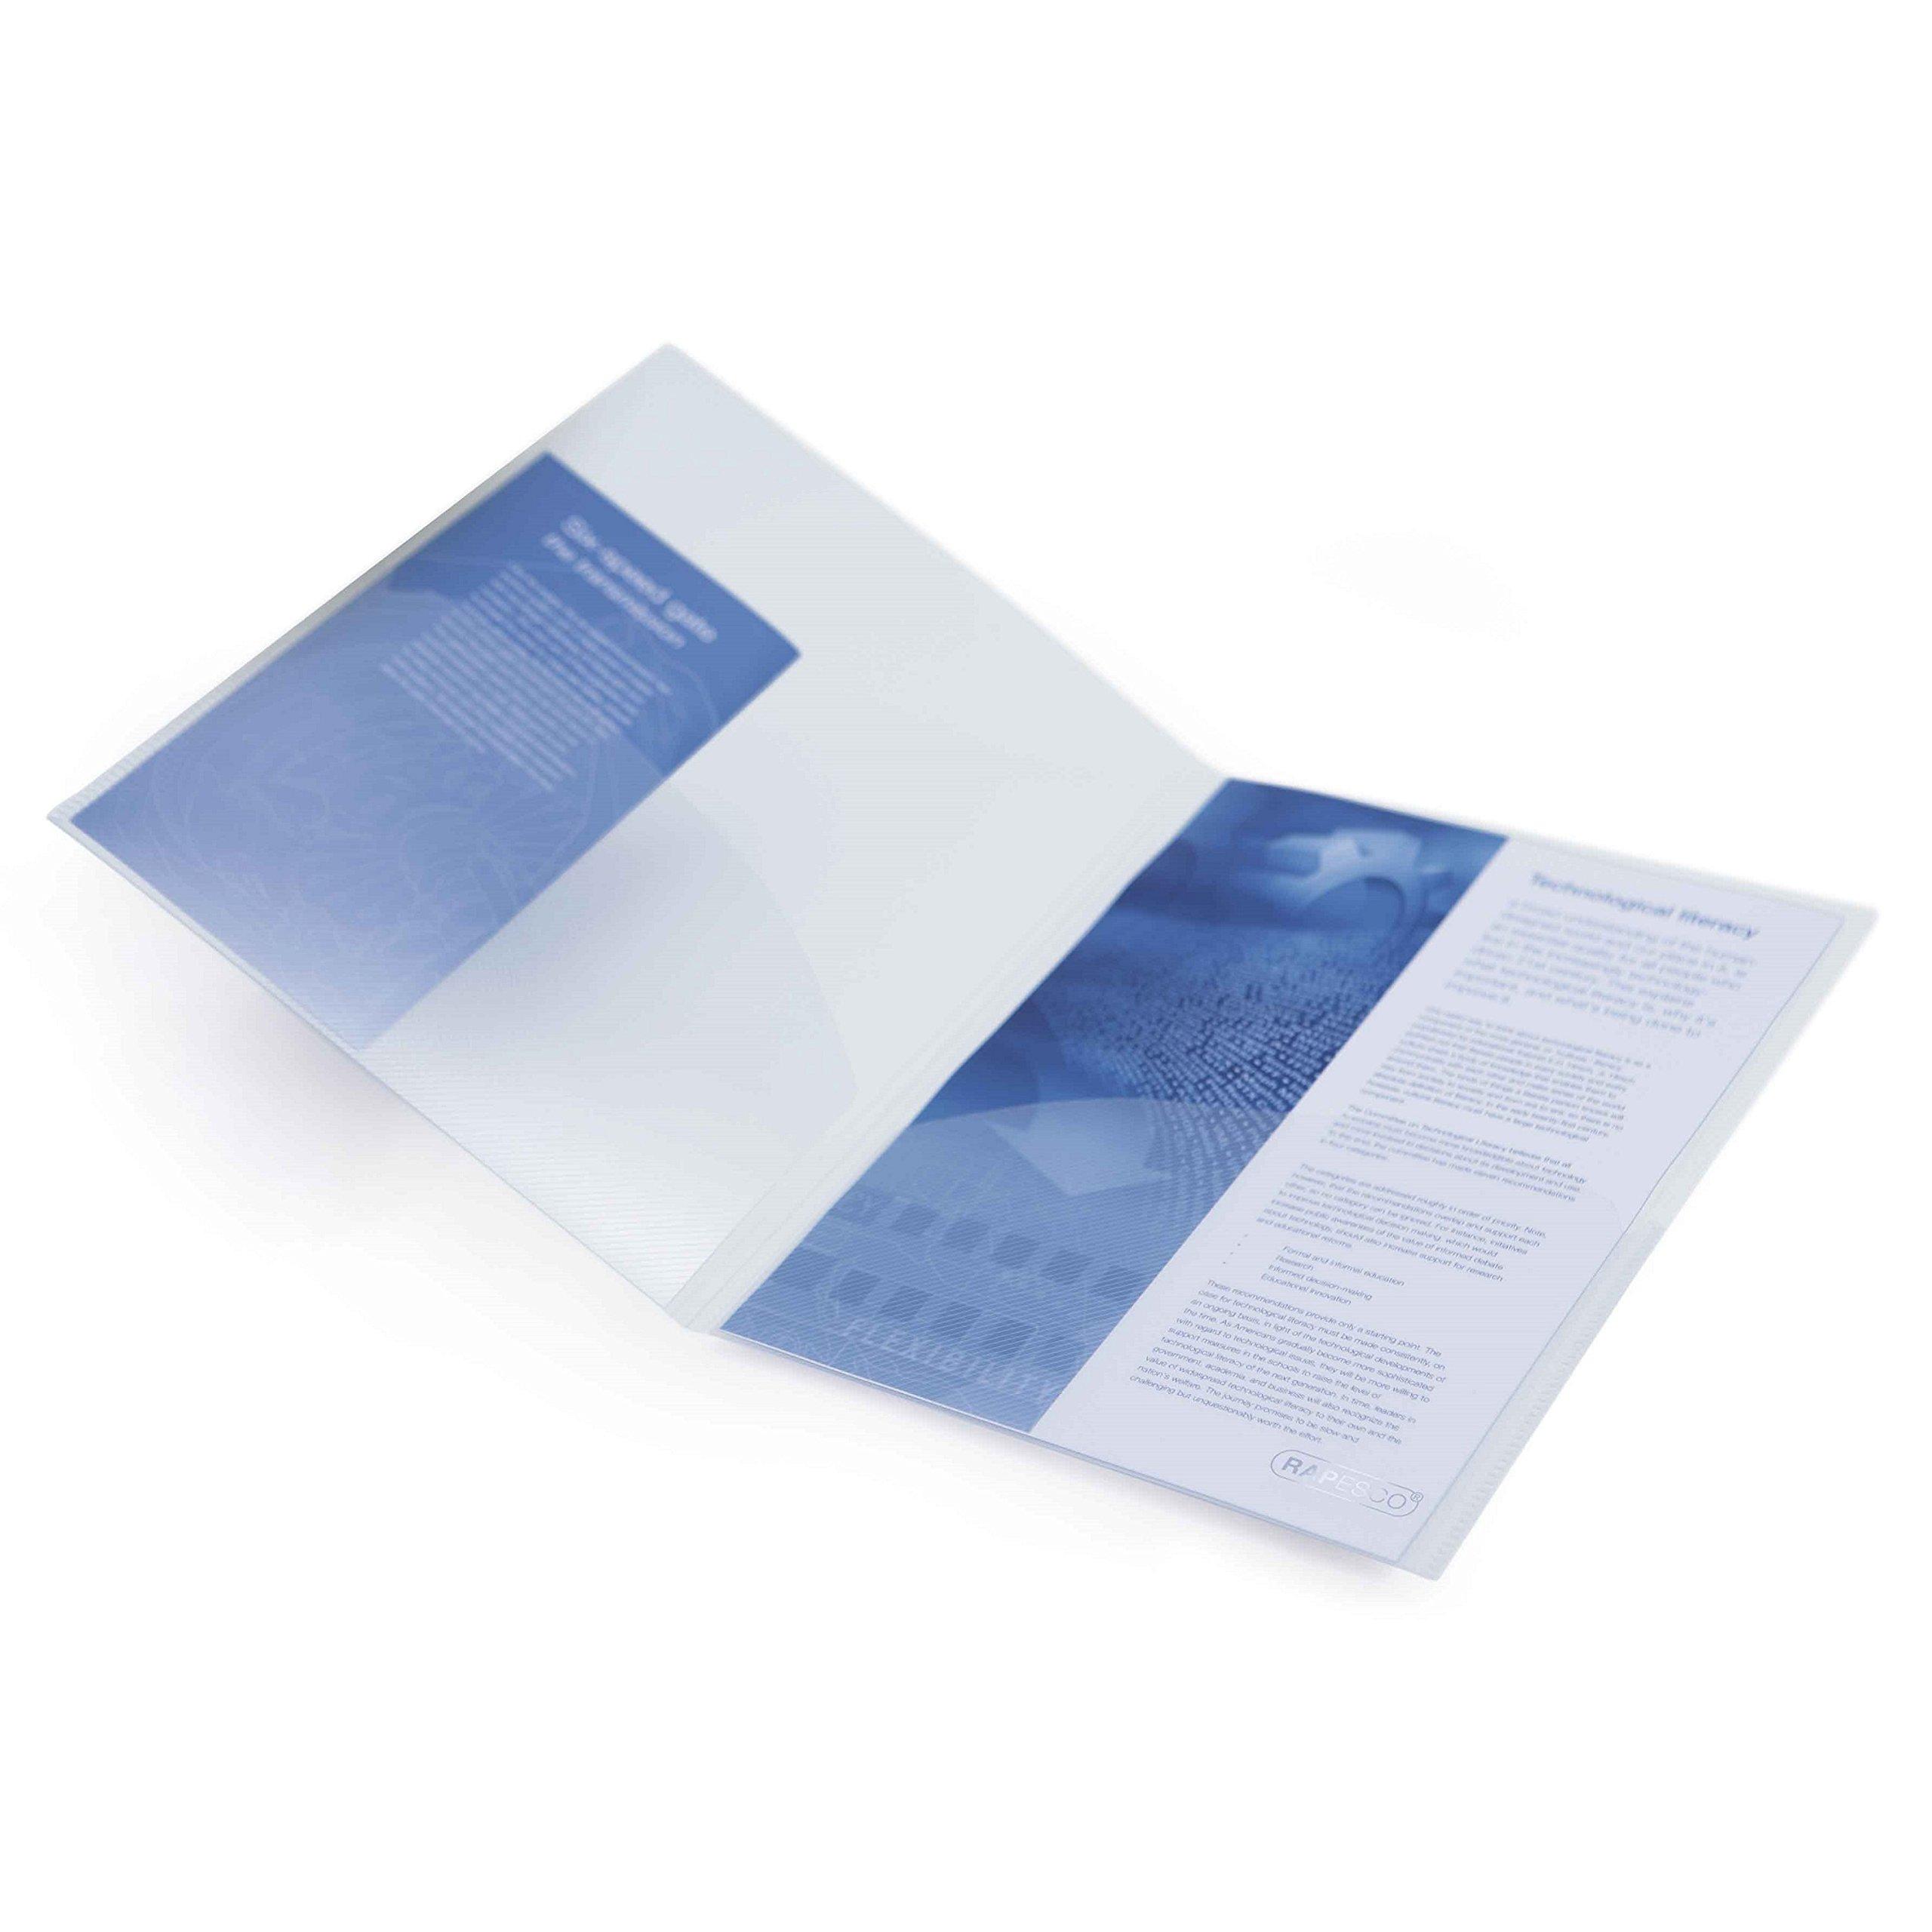 Rapesco Documentos transparente 5 unidades Carpeta portafolios A4 con doble bolsillo